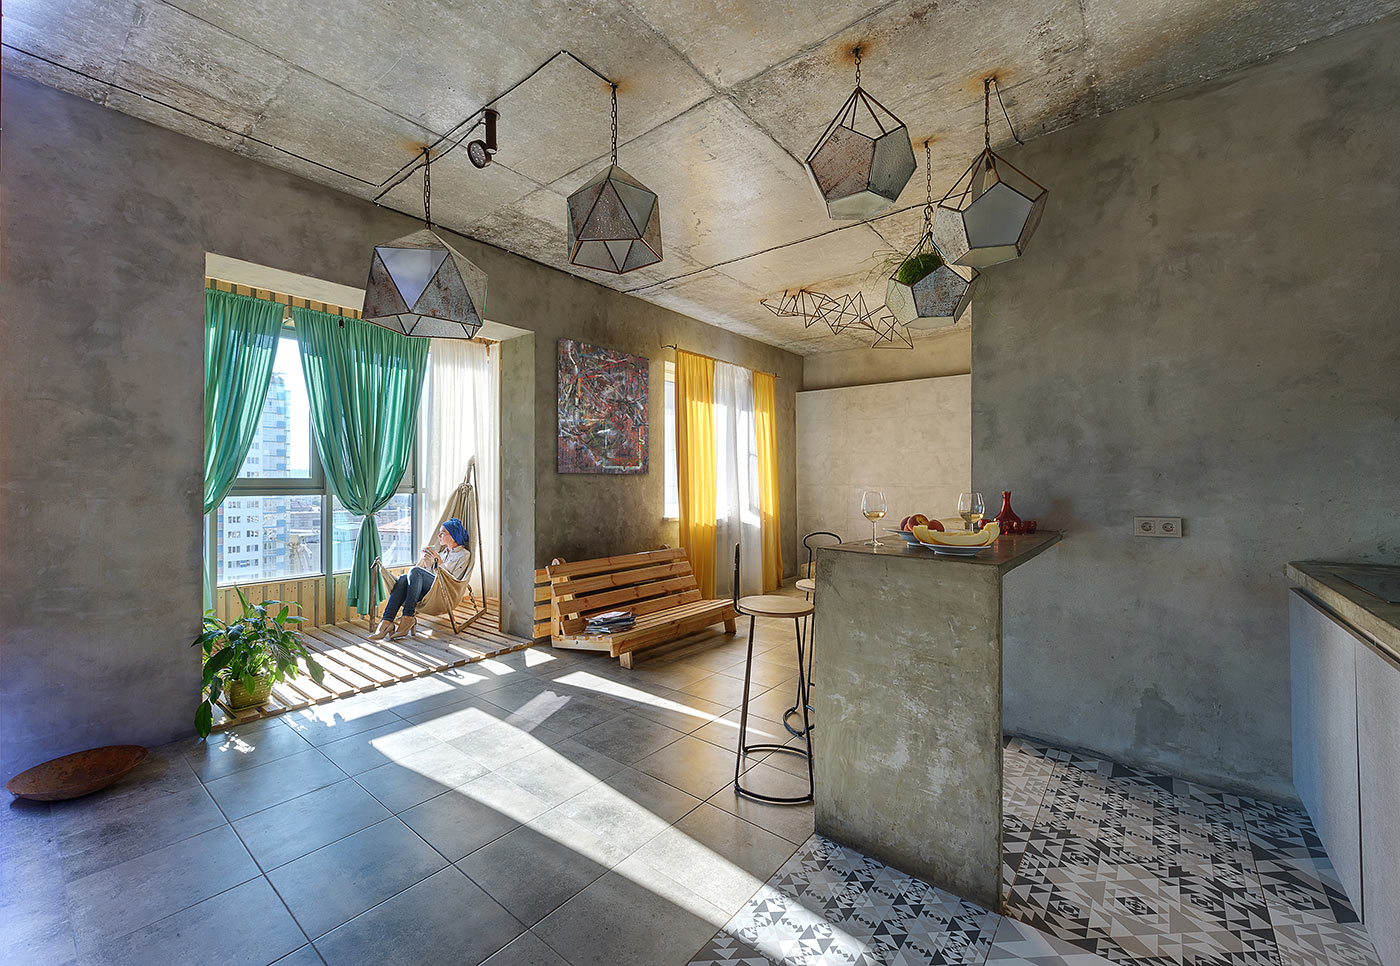 Mehr Khaneh - an industrial style loft